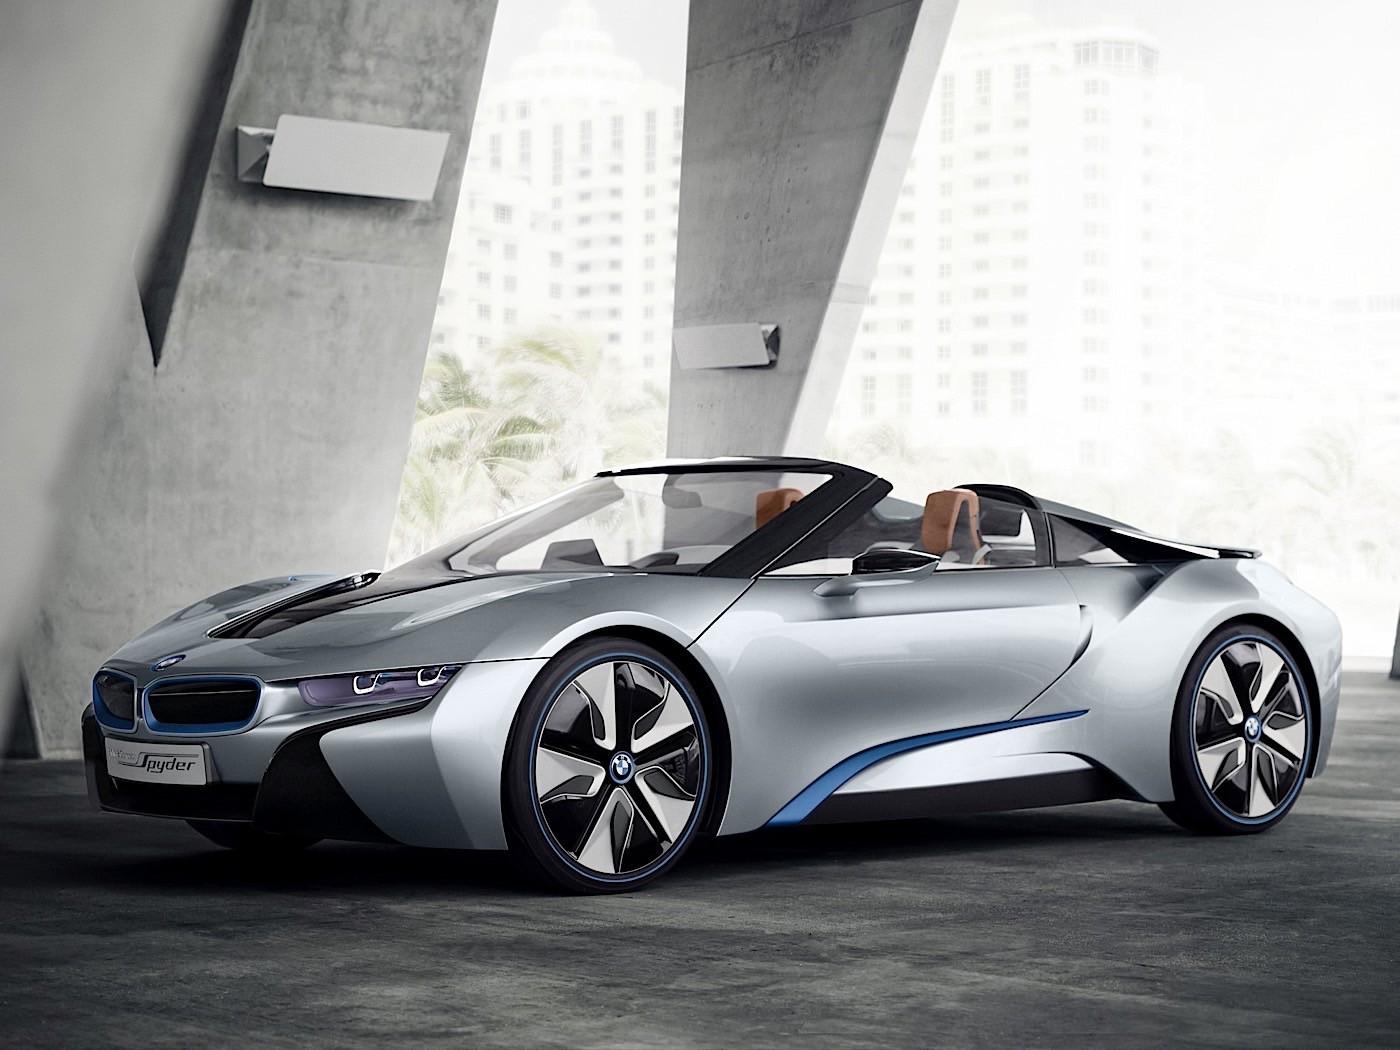 BMW презентует родстер i8 через два года 1